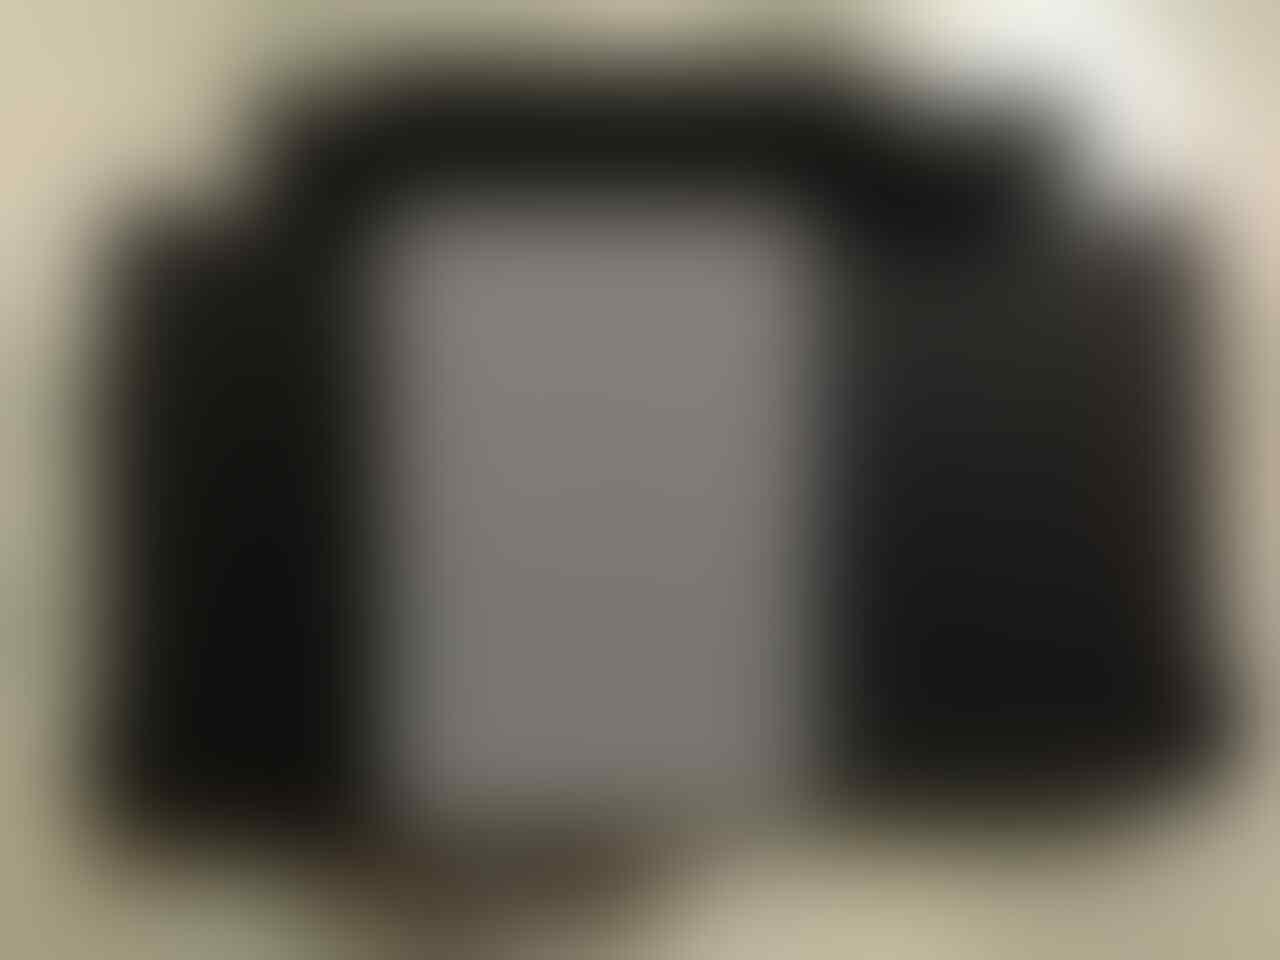 WTS Nintendo 3DS (US Version) Second